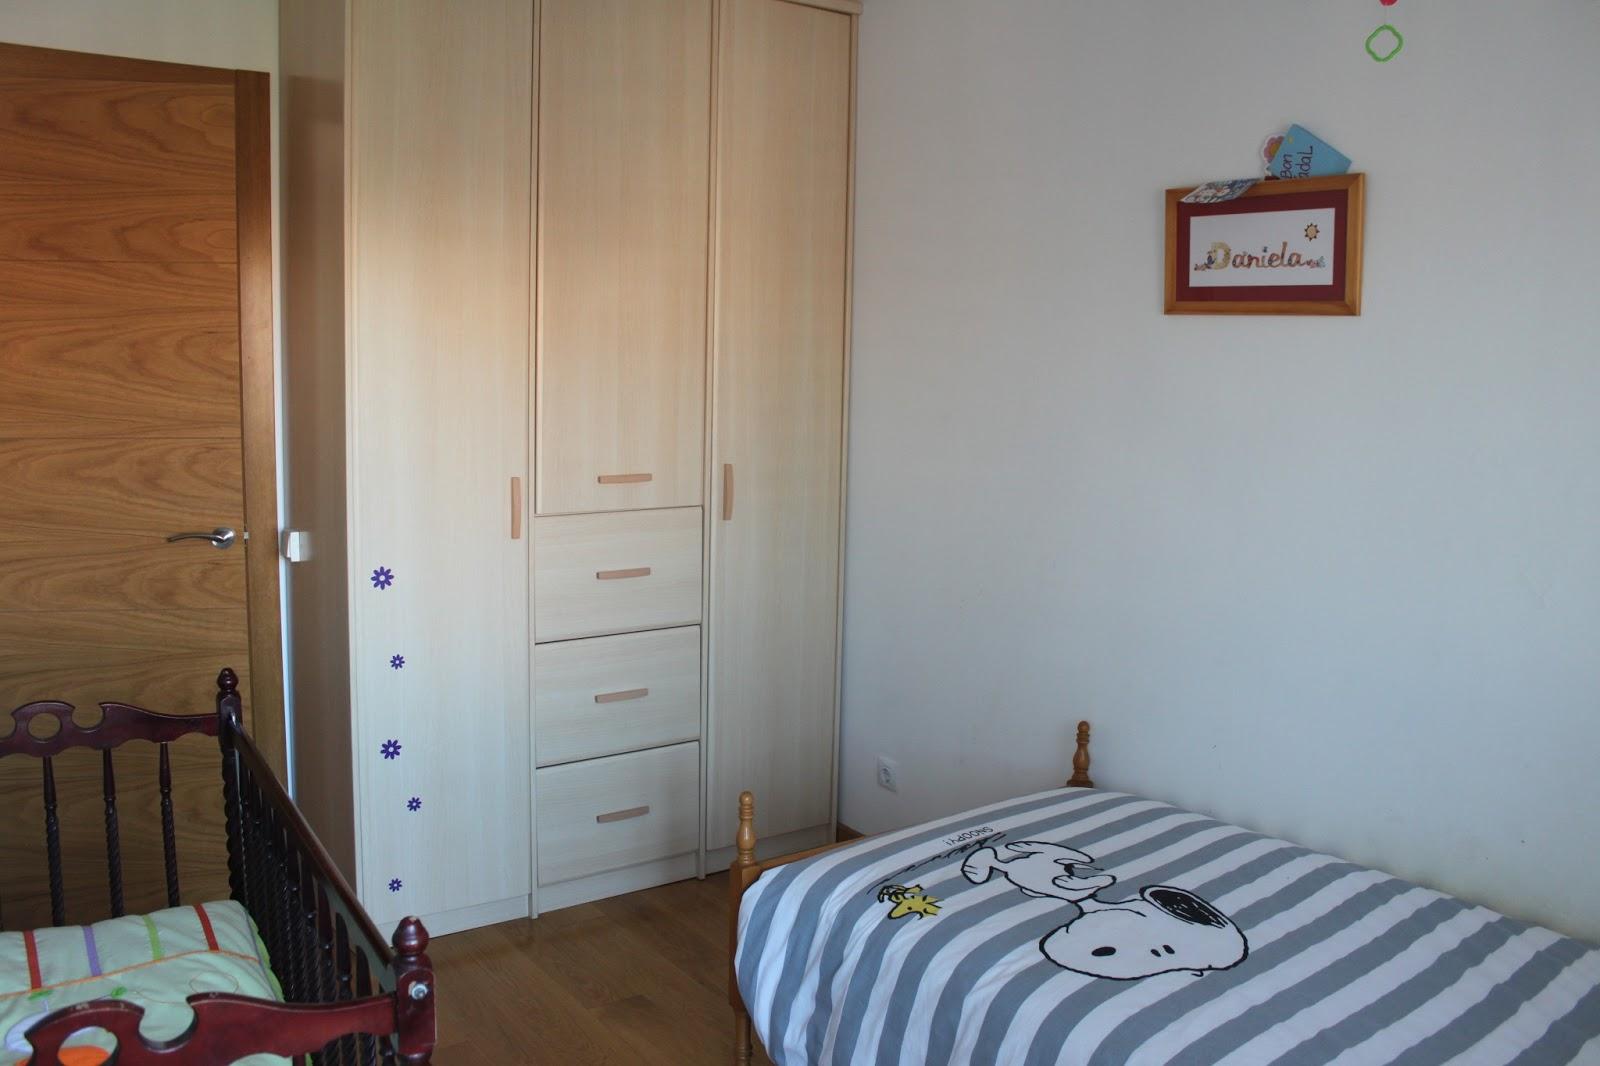 Estudio de arquitectura emearq decoraci n de una - Habitacion infantil decoracion ...